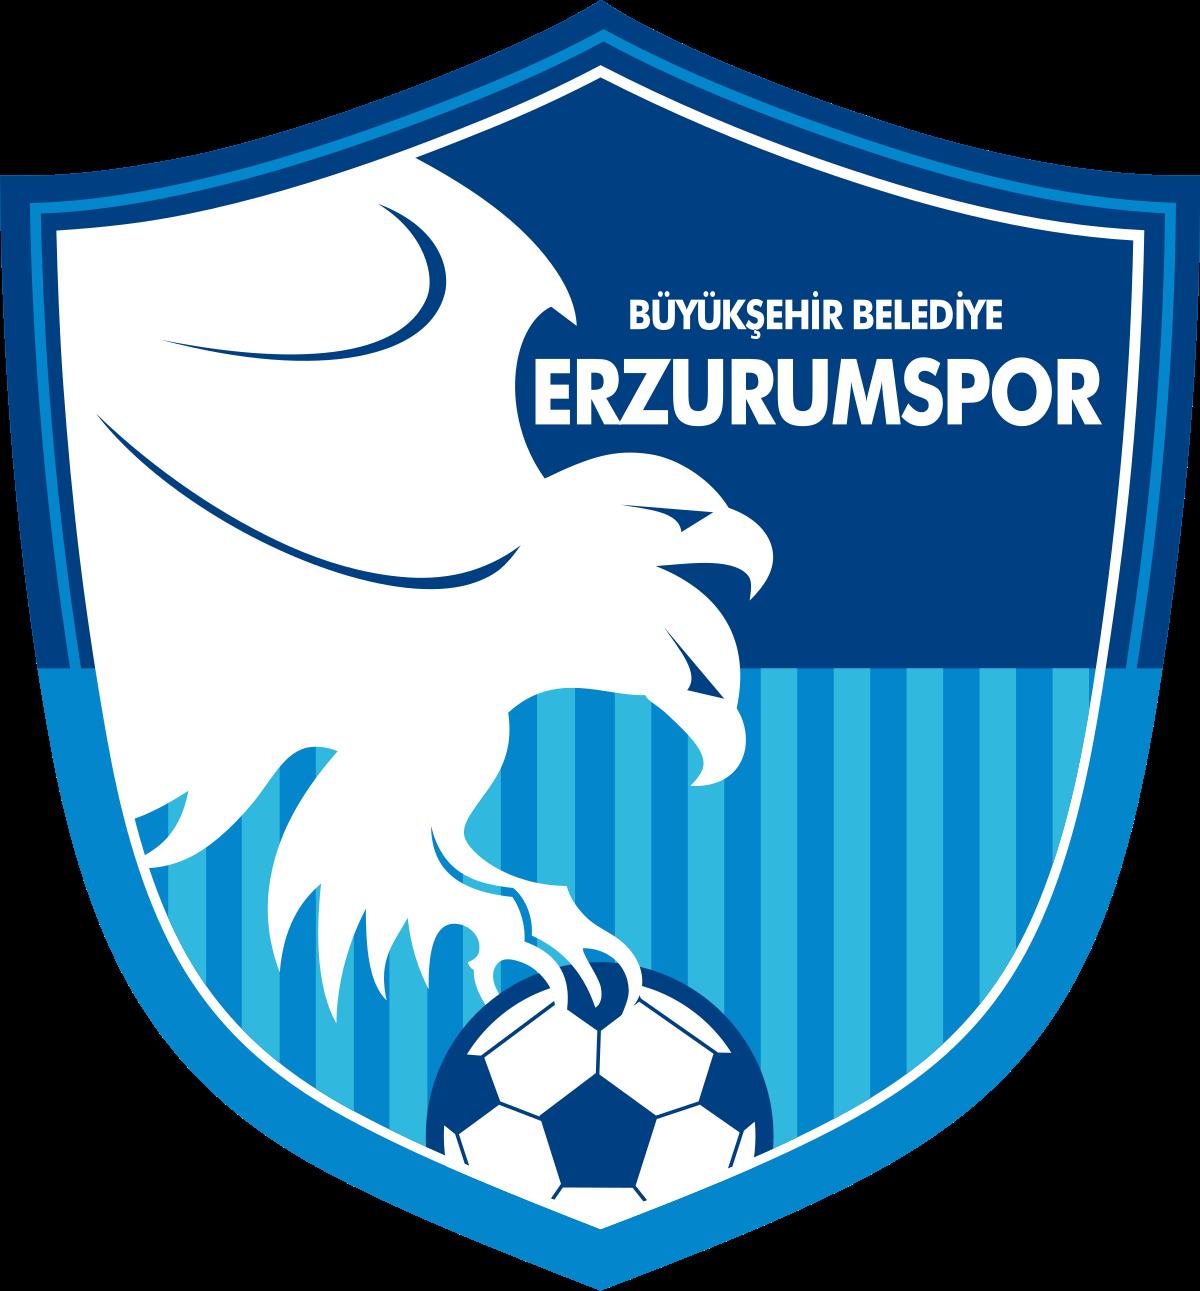 Programme TV Erzurumspor